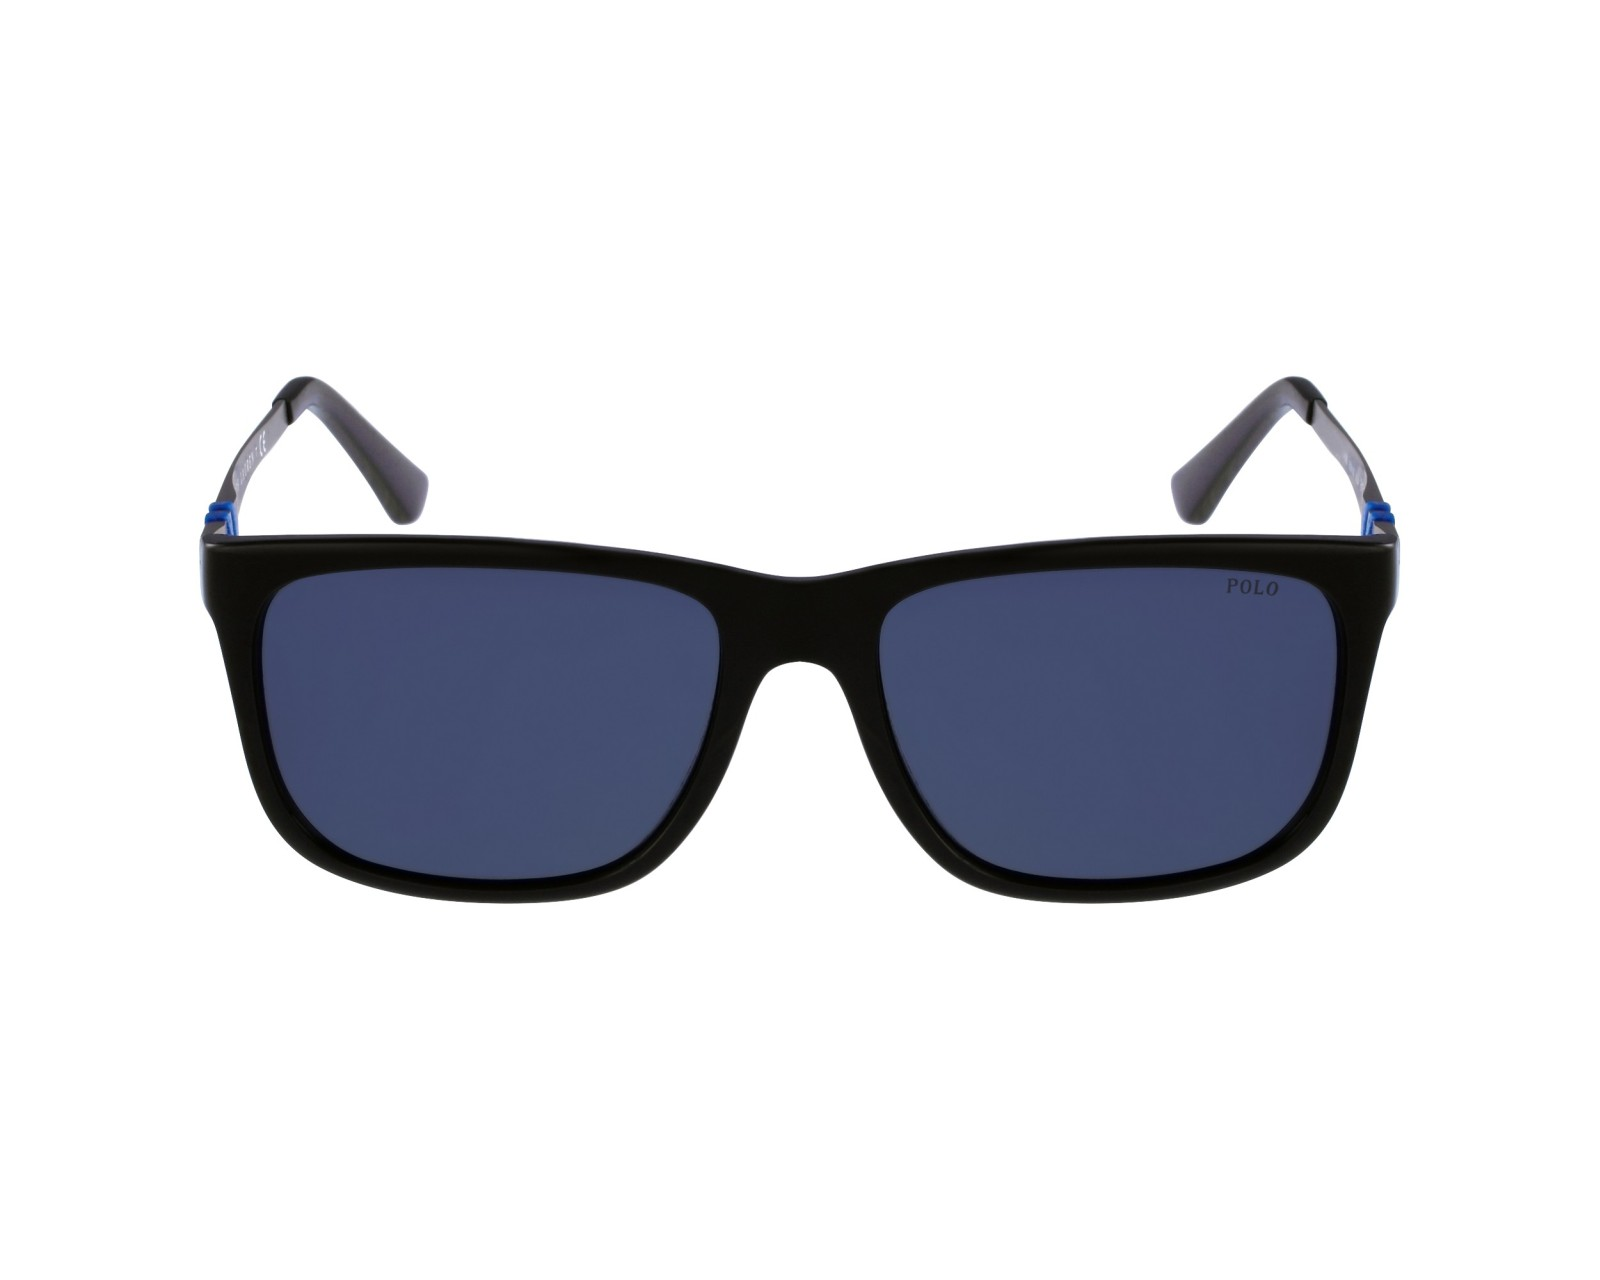 1648b16577d5 Sunglasses Polo Ralph Lauren PH-4088 5001/87 55-17 Black Silver profile